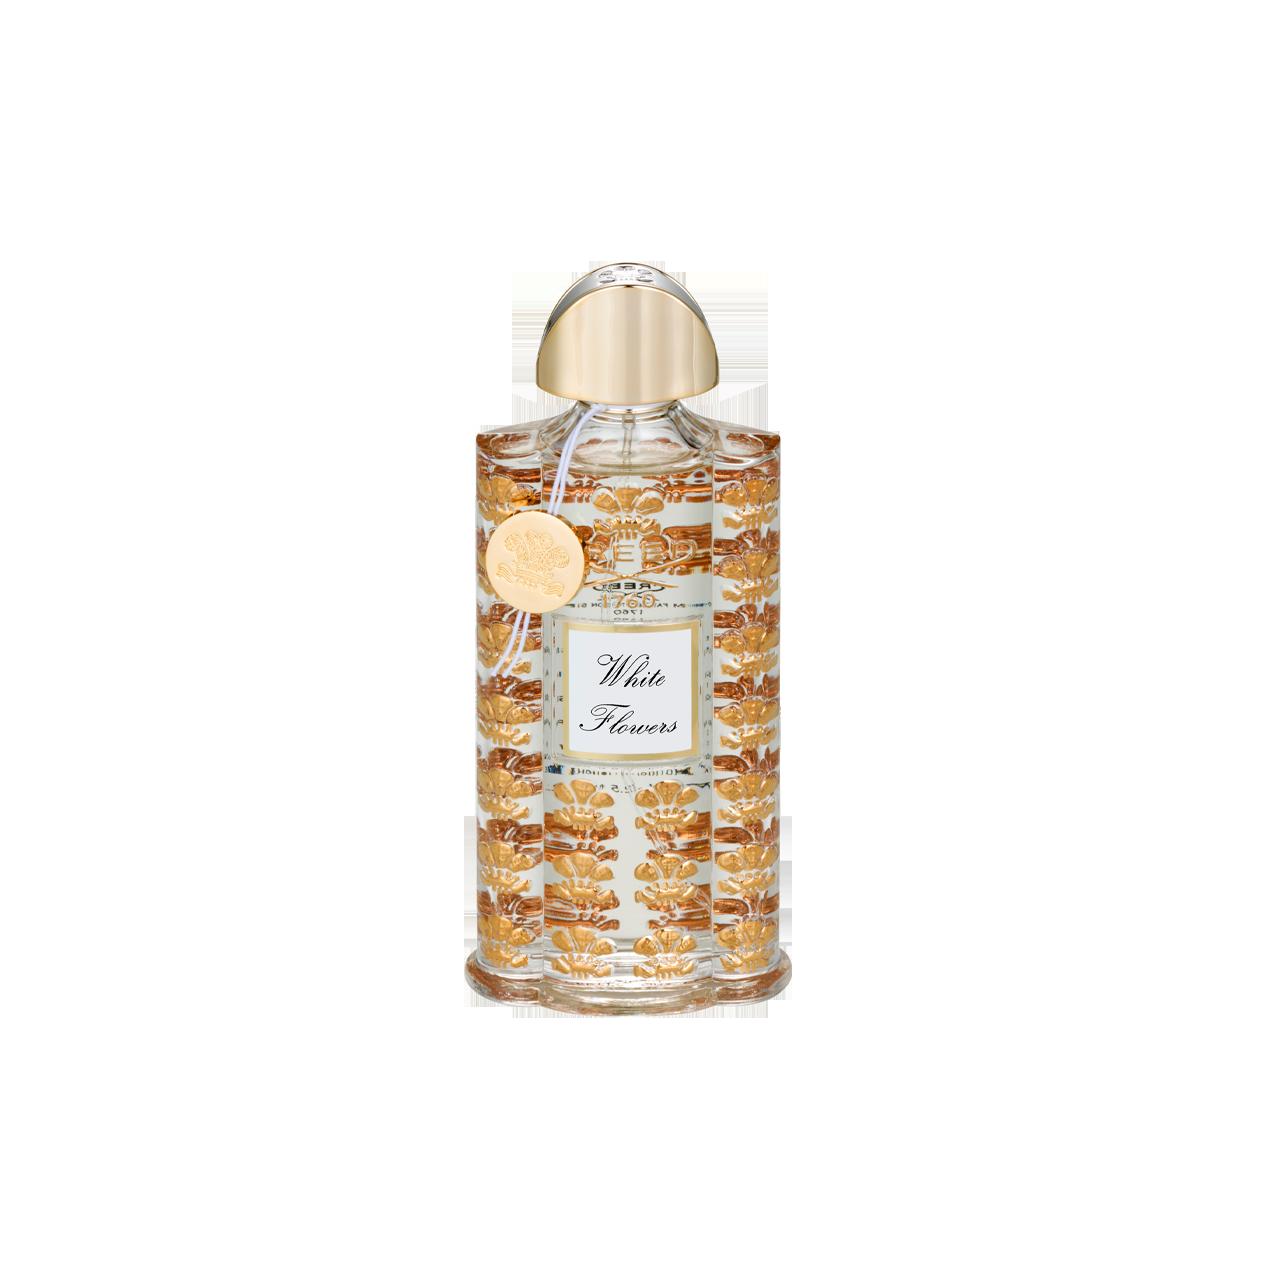 White Flowers - Les Royales Exclusives Millesime